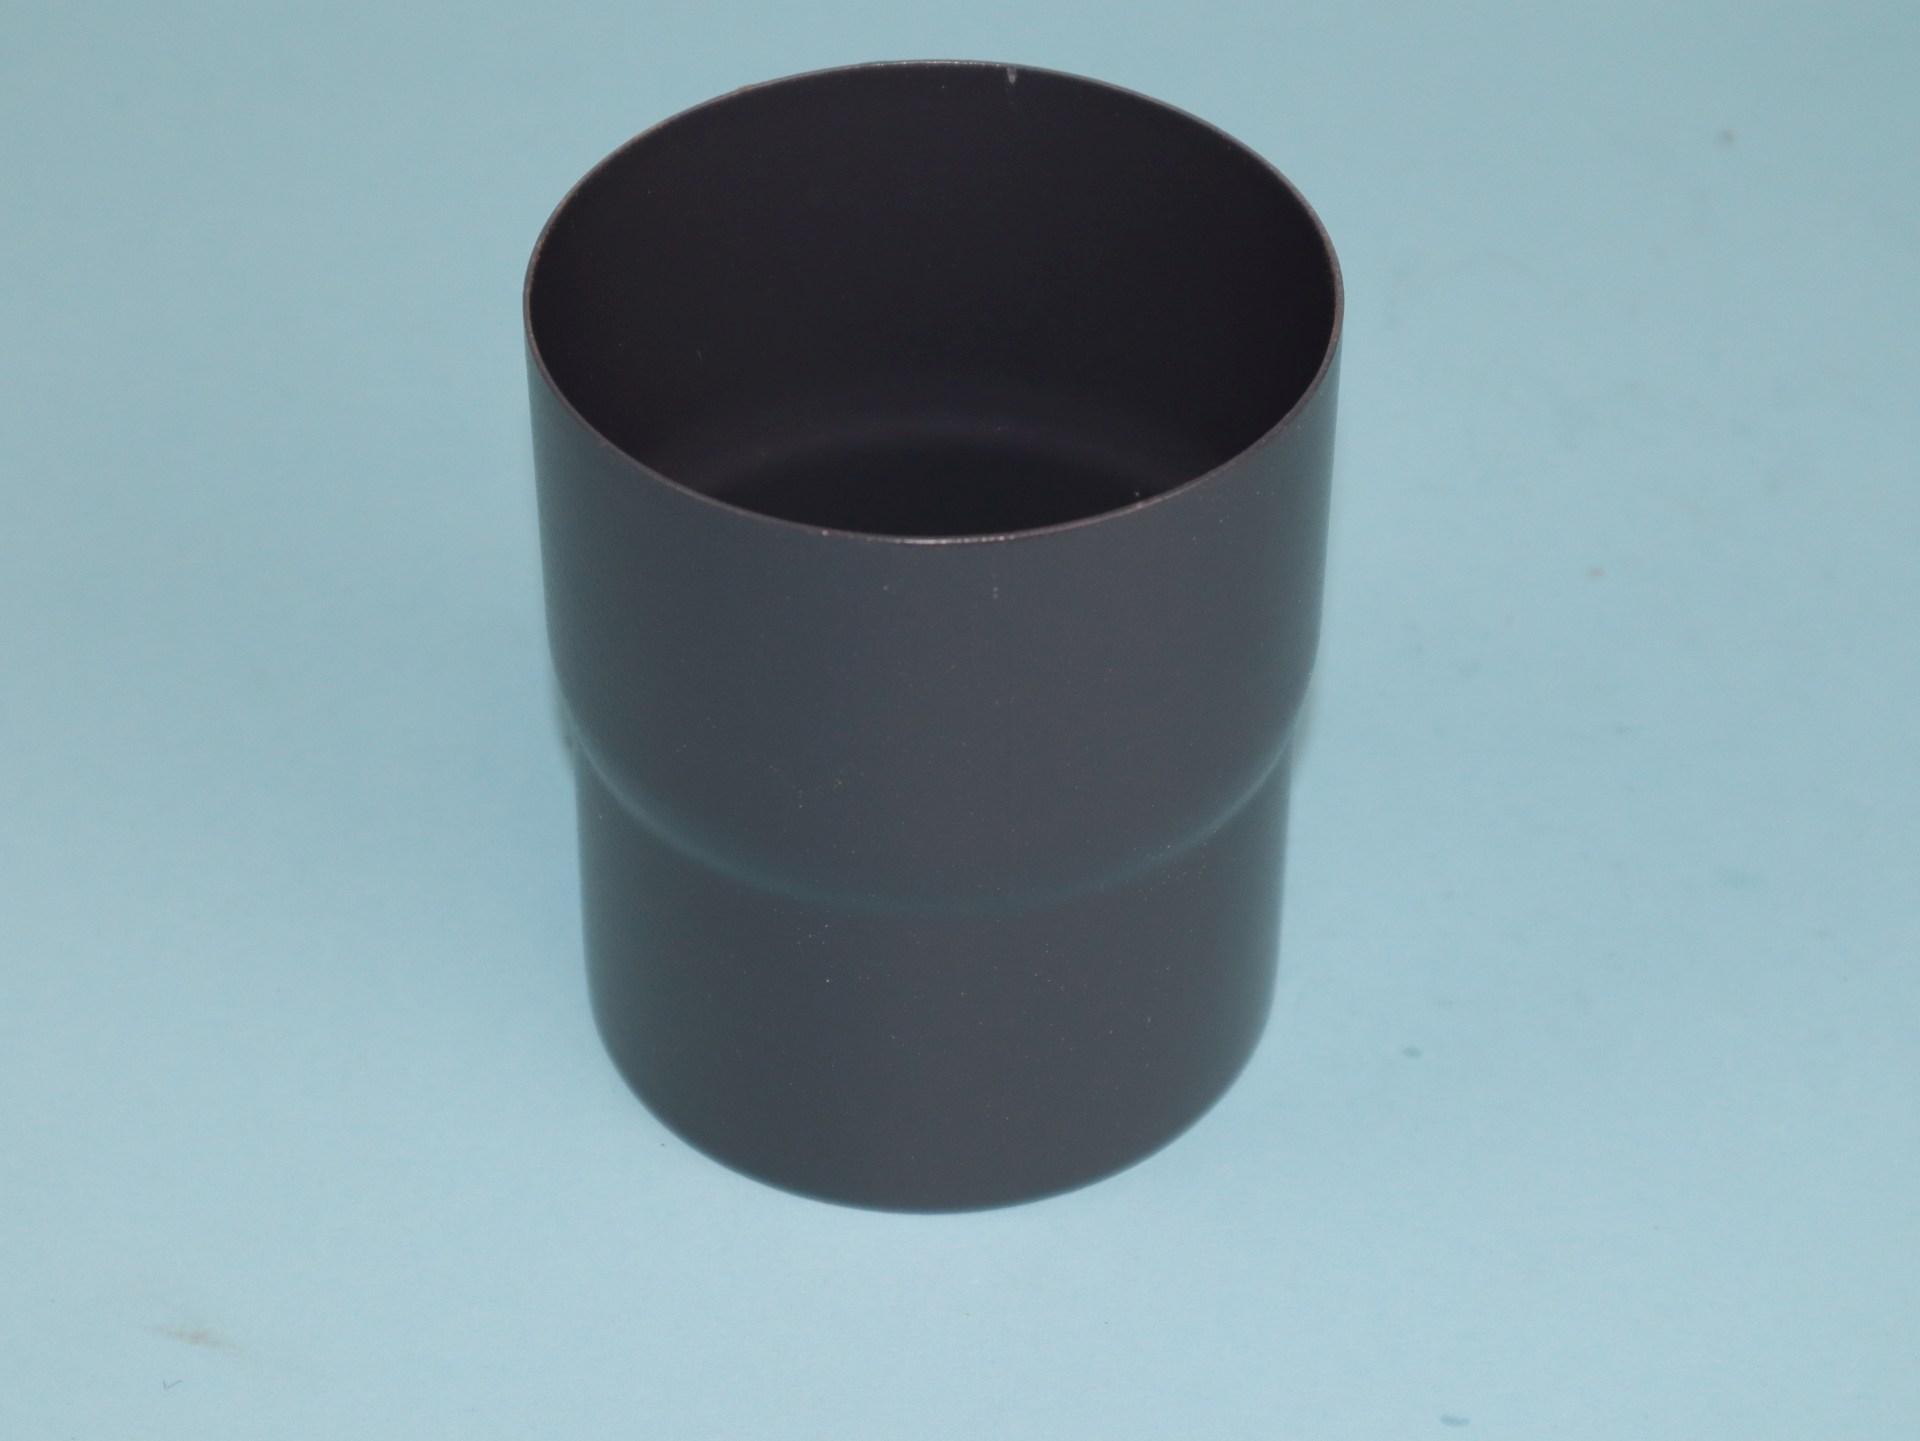 Fallrohrverbinder ROBUST System - anthrazit